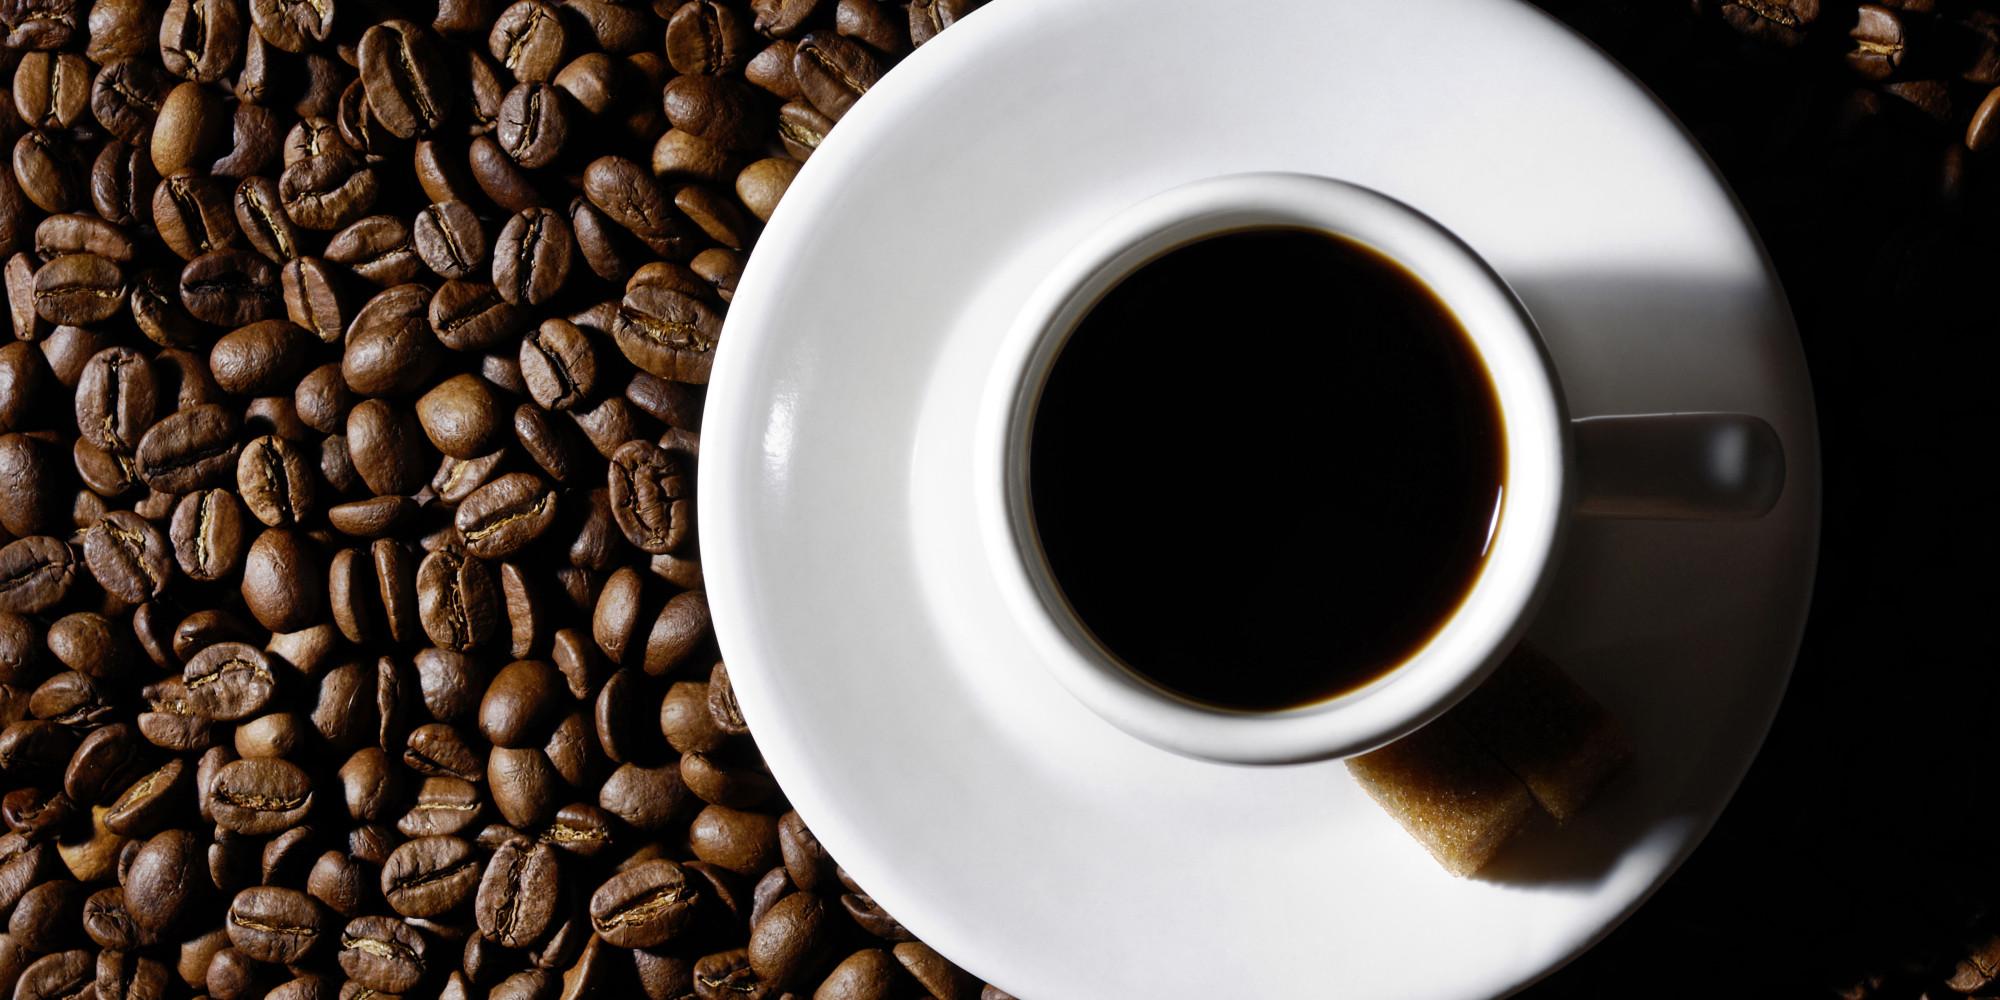 http://i.huffpost.com/gen/1458329/images/o-COFFEE-BEANS-facebook.jpg